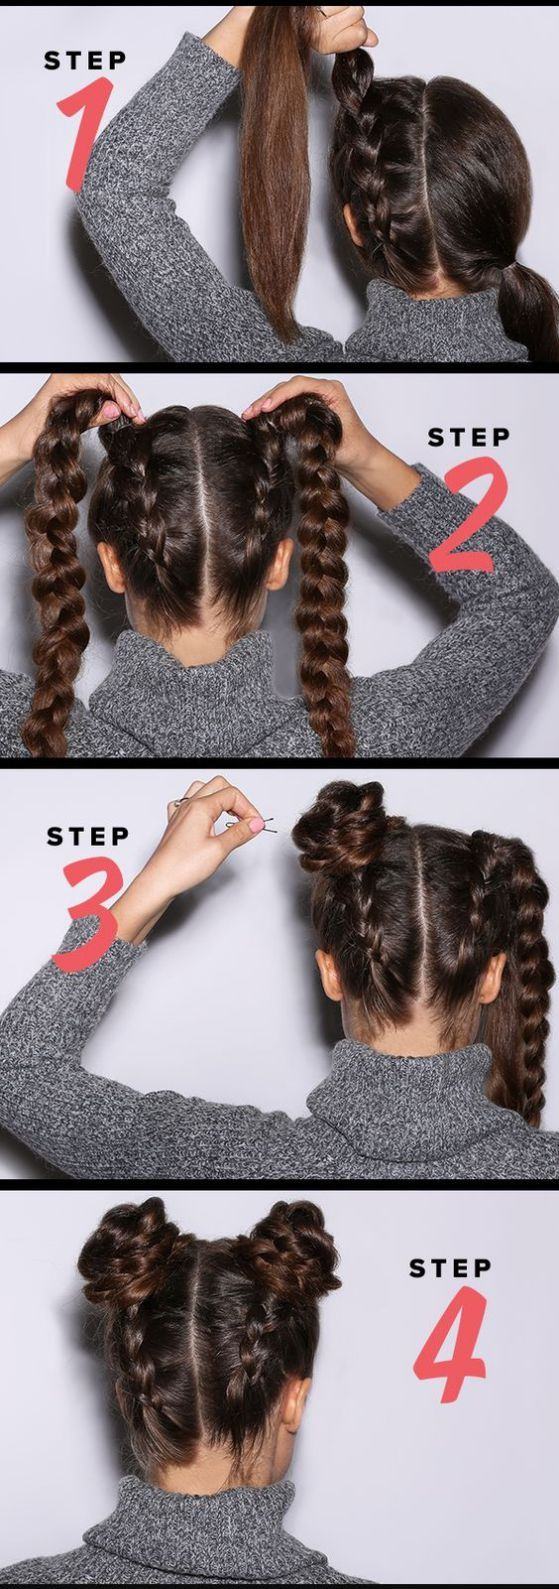 Rápido y fácil peinados para niñas faciles paso a paso Colección de cortes de pelo estilo - +40 Peinados para niñas fáciles y rápidos, tutos paso a ...